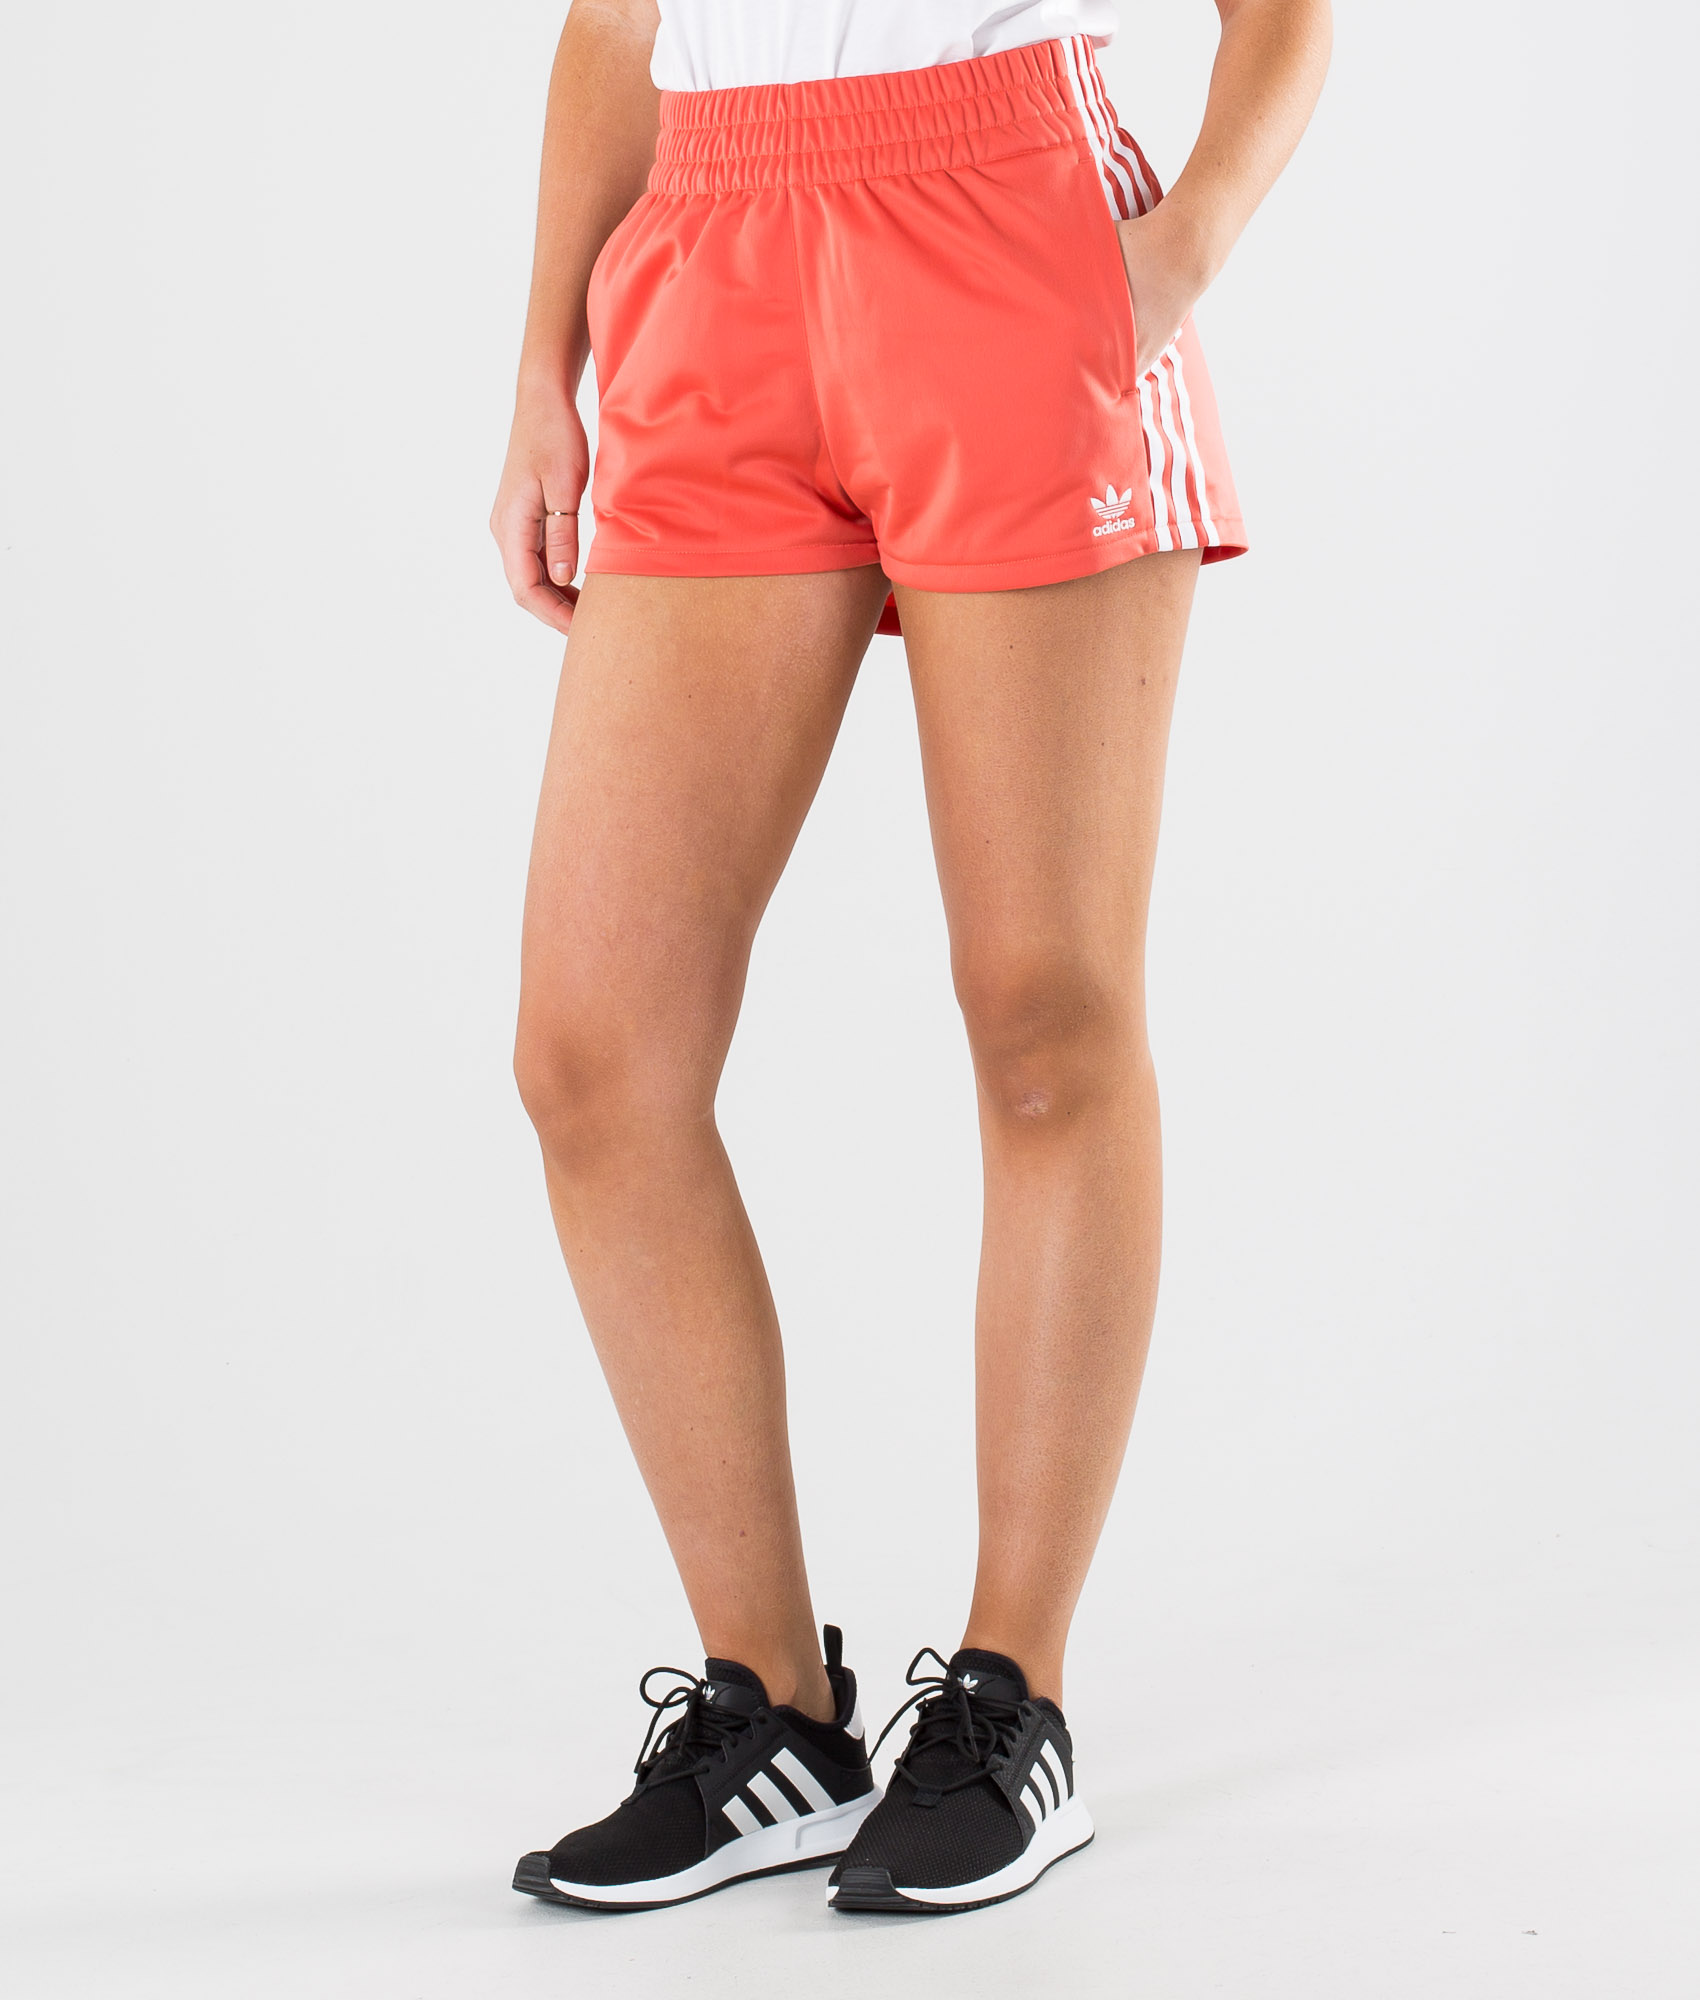 Adidas Originals 3 Stripe Short Shorts Trace Scarlet White Ridestore Com